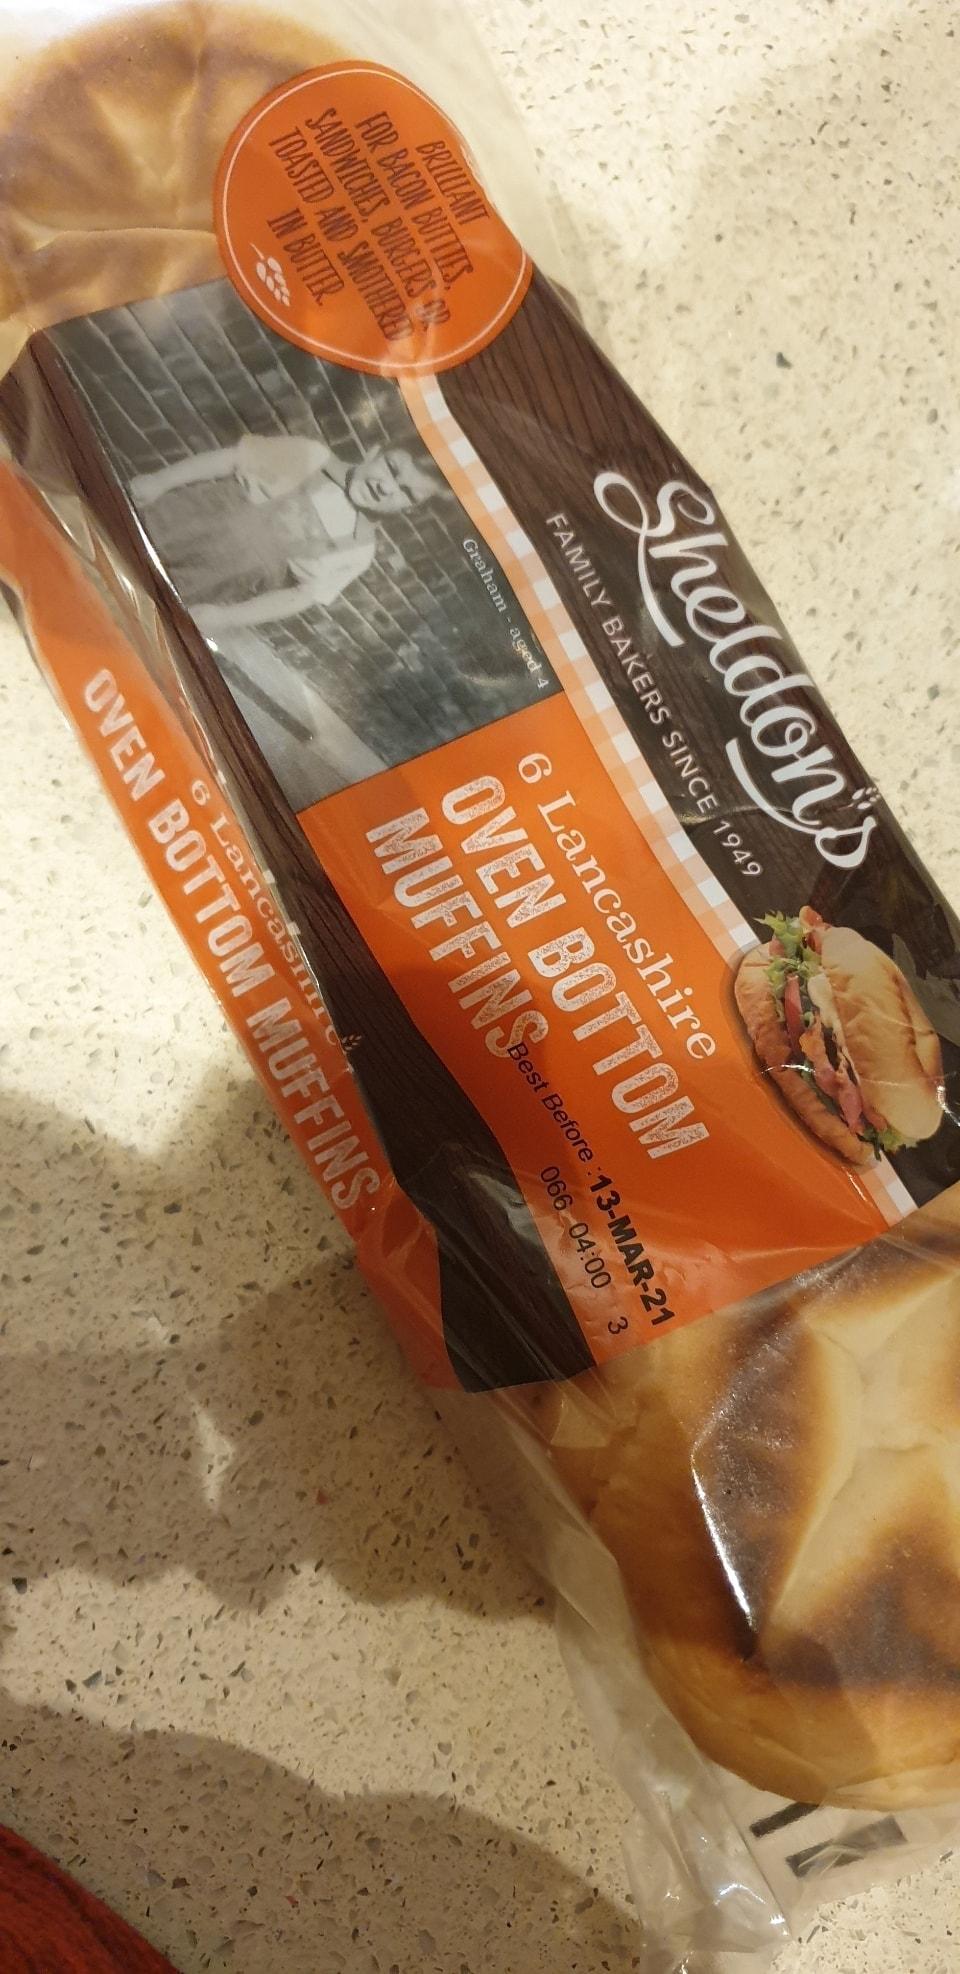 Oven bottom muffins (tesco rescue)